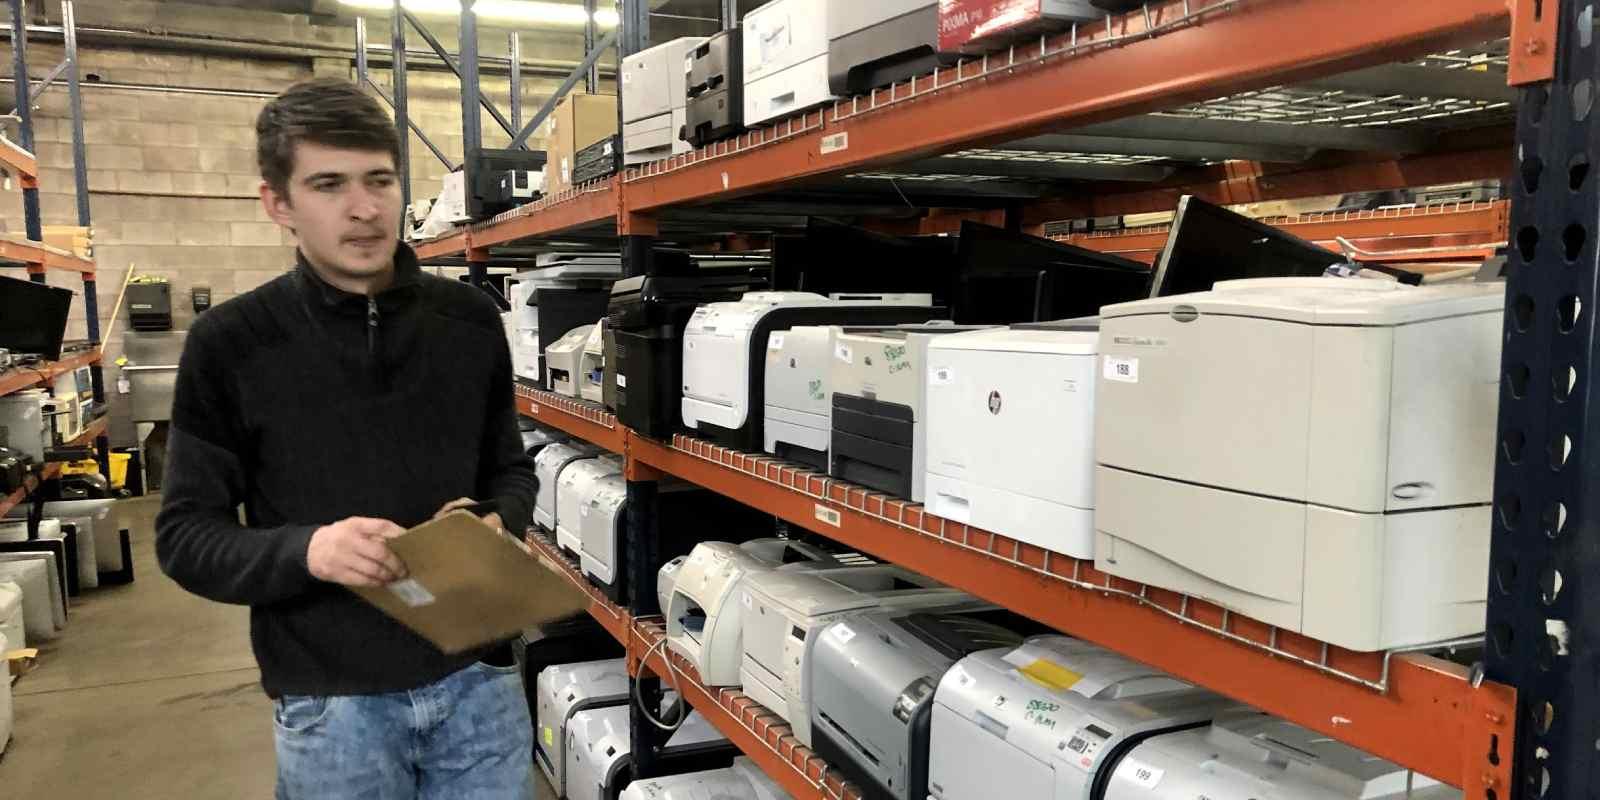 Mark assessing business printers